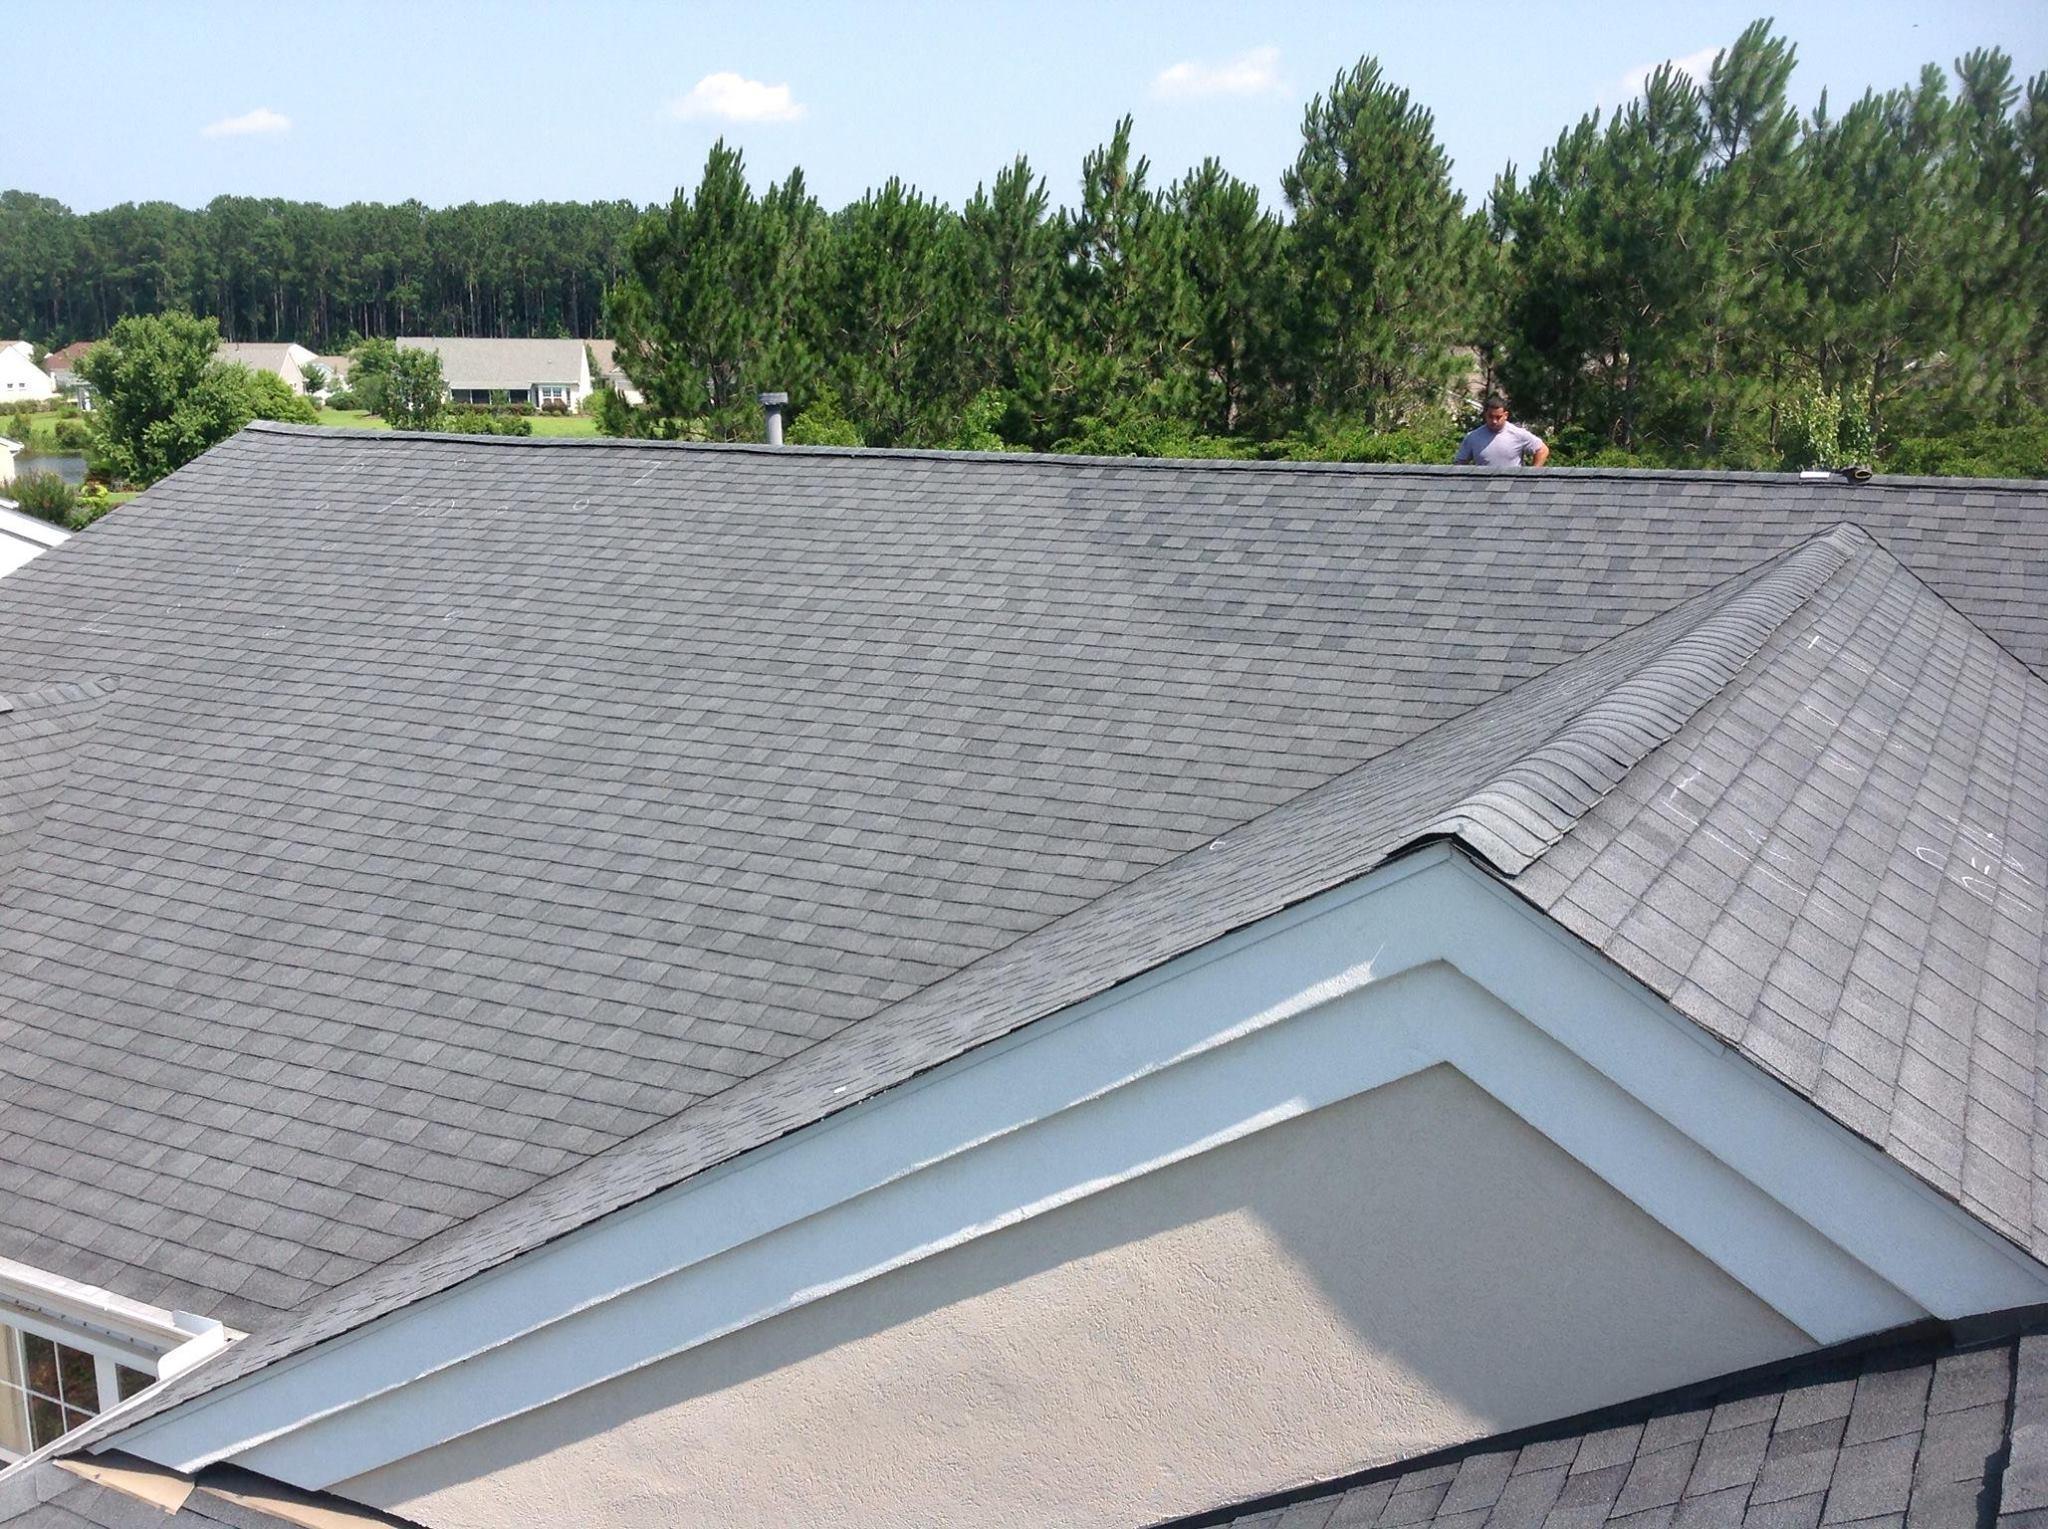 RoofCrafters-Savannah image 47